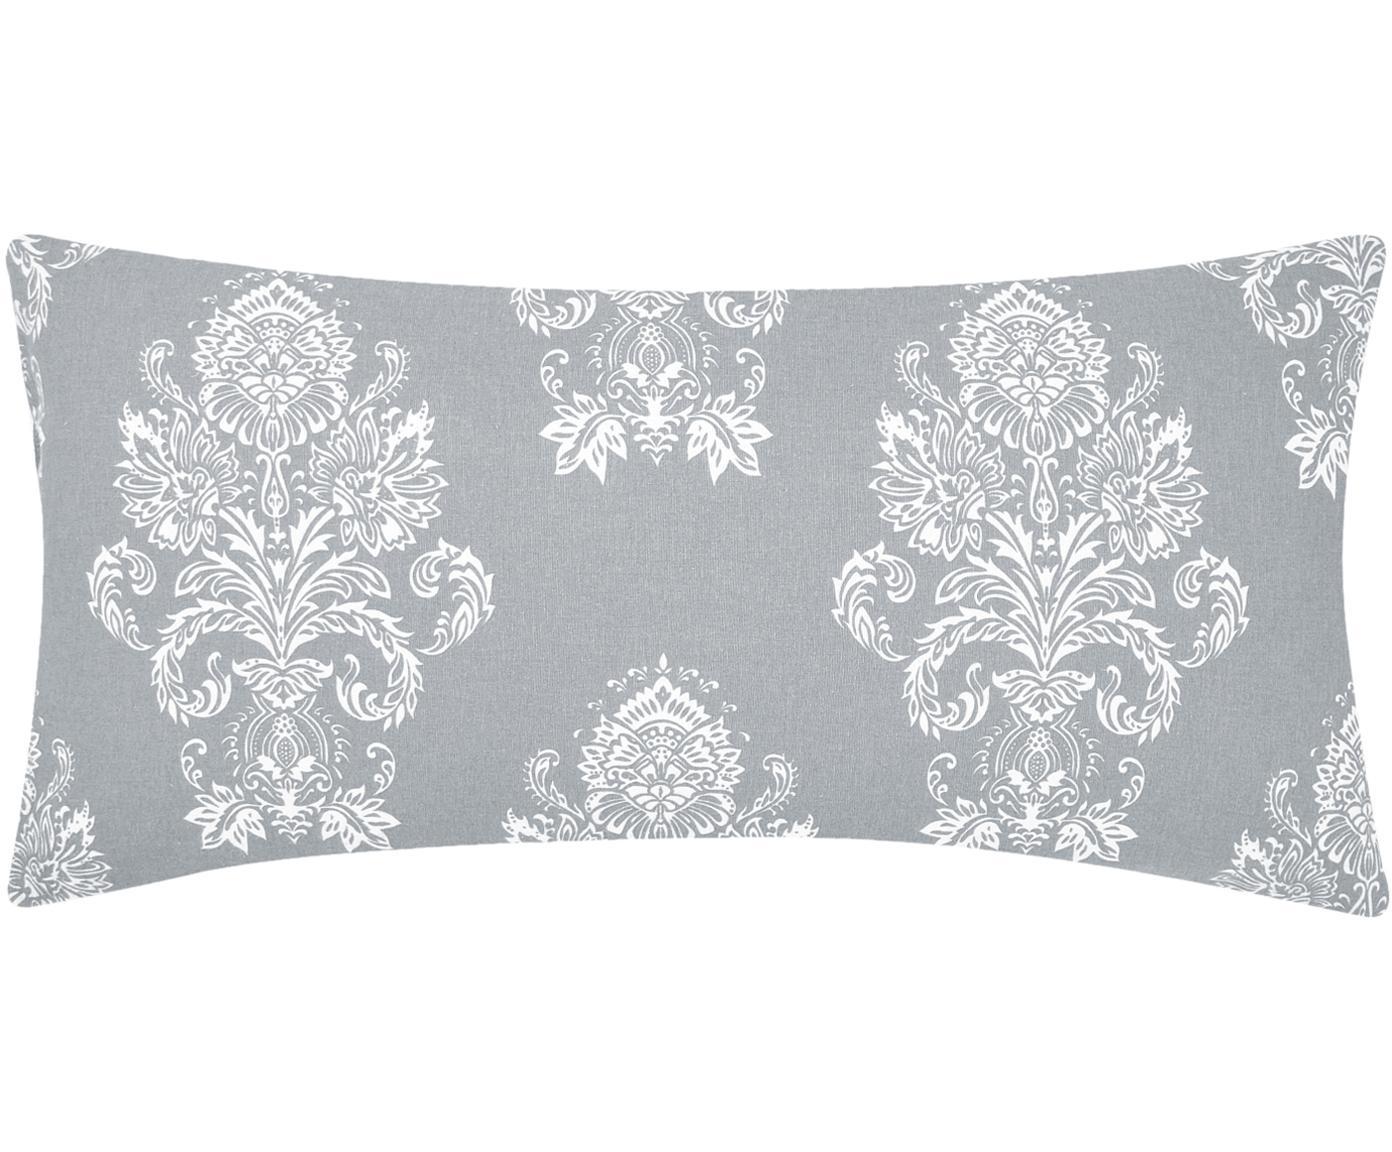 Poszewka na poduszkę z flaneli Sissi, 2 szt., Szary, biały, S 40 x D 80 cm